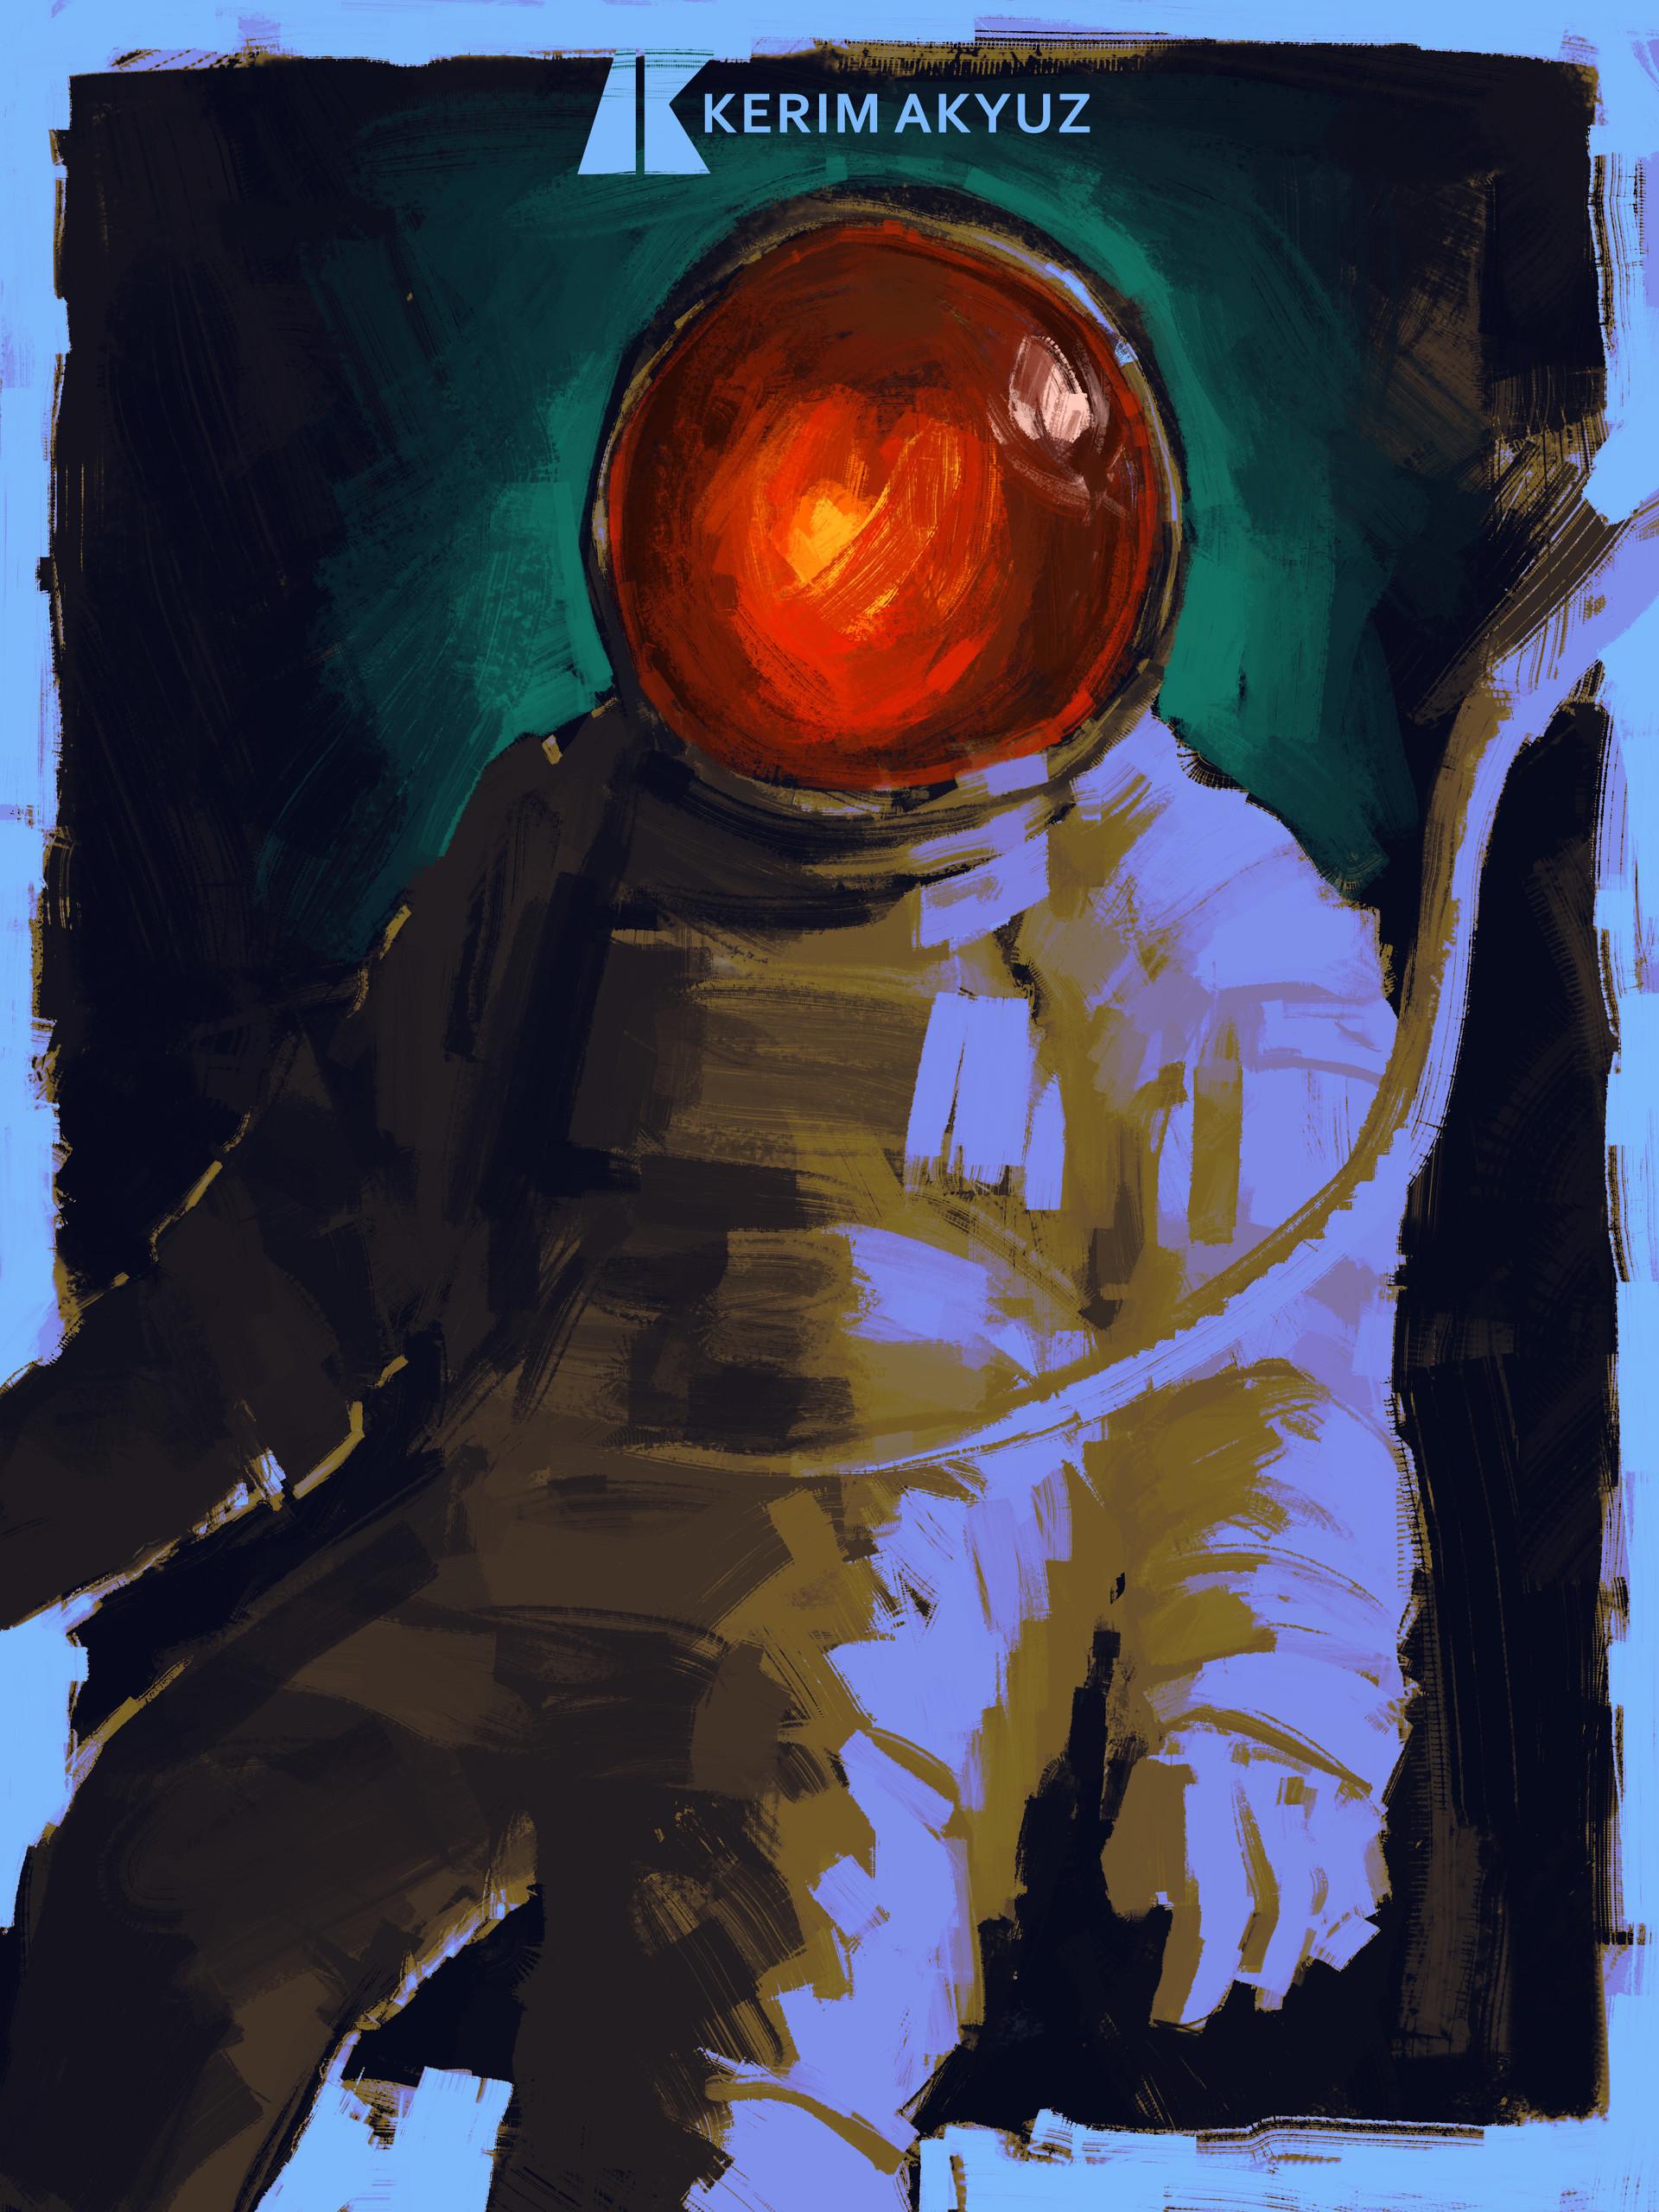 Kerim akyuz 197 astronautslife8